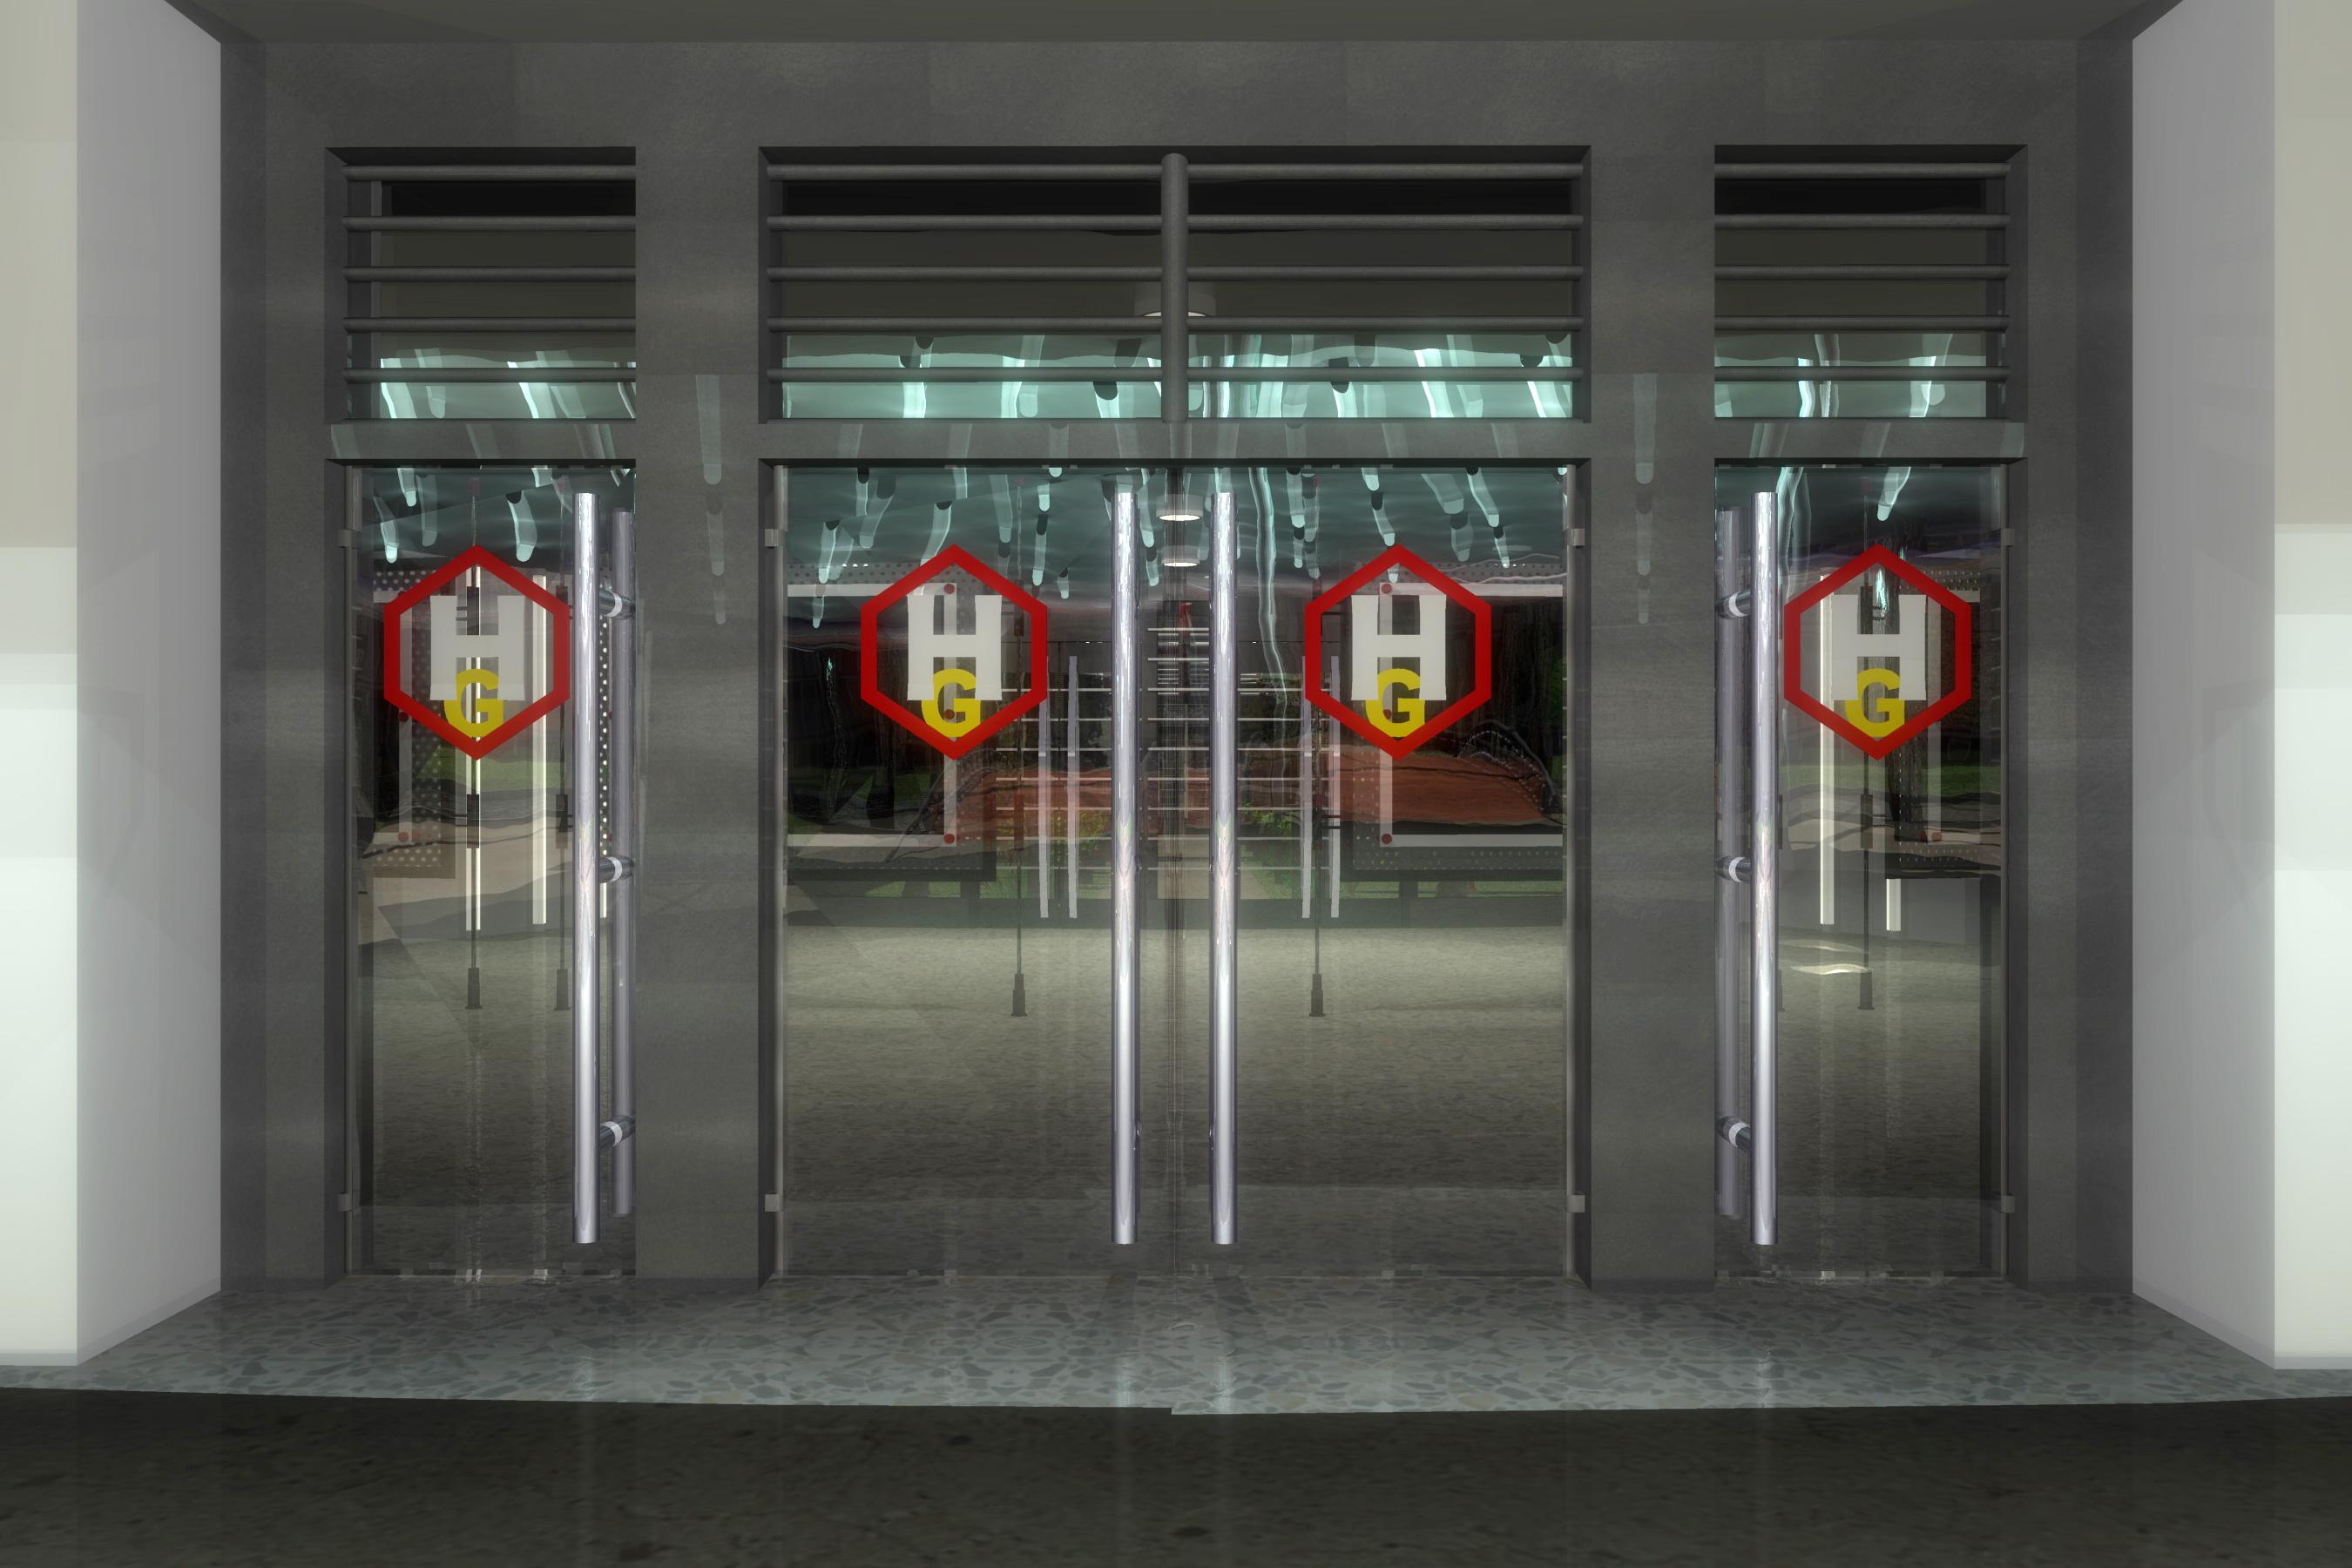 Rear Entry Doors Of Rhg R D Facility Image Megatokyo 2041 Indie Db